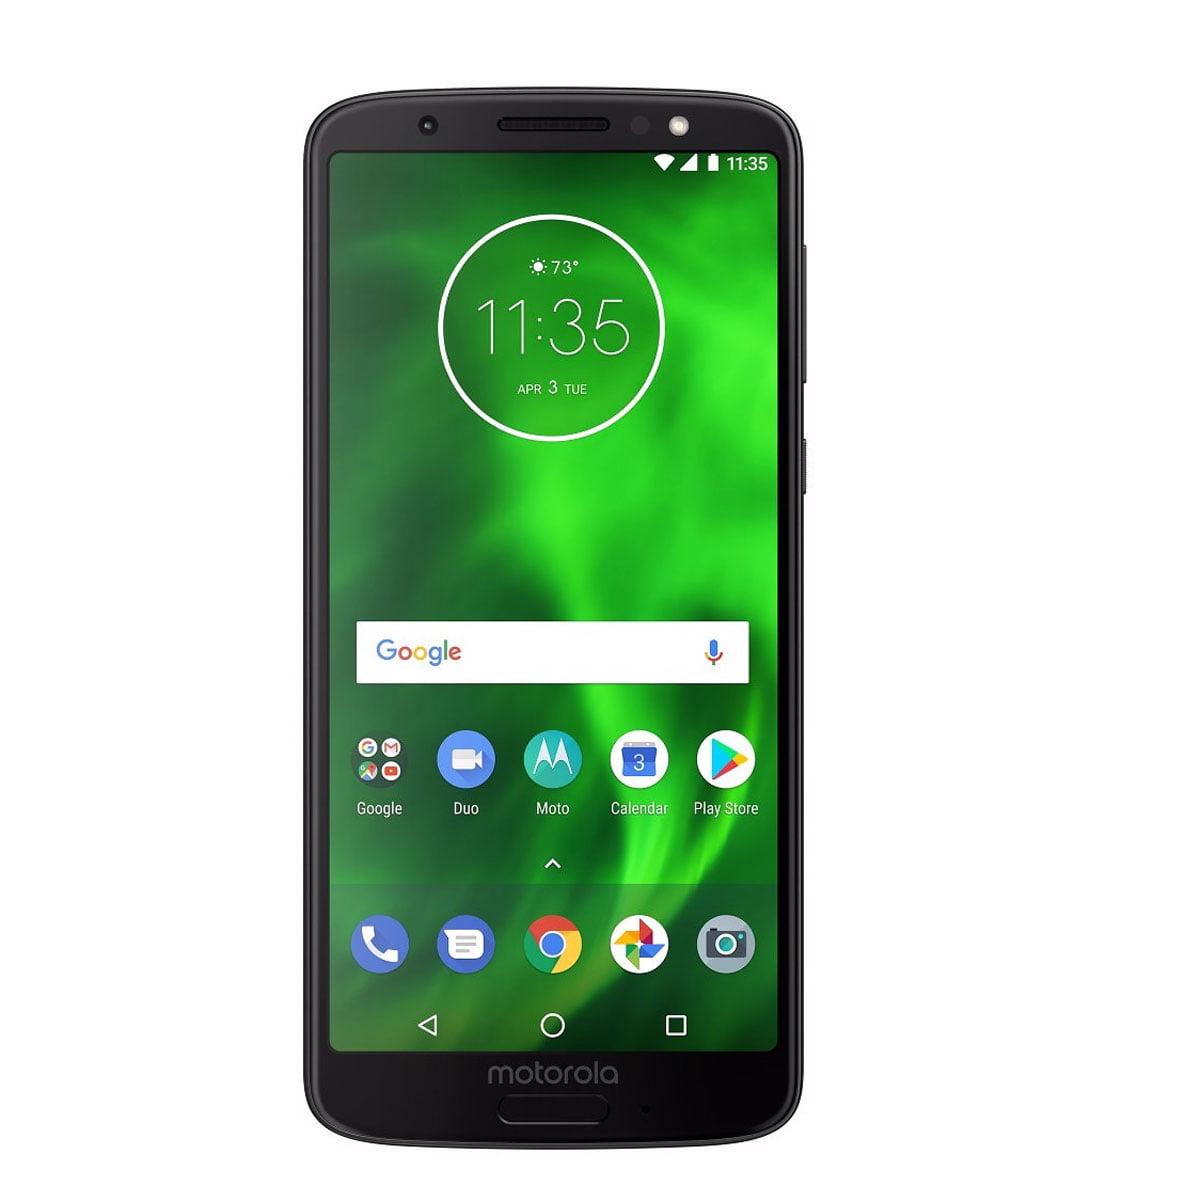 "New Motorola Moto G6 32GB XT1925-2 Dual SIM Factory Unlocked 4G LTE 5.7"" IPS LCD Smartphone Dual 12MP + 5MP... by Moto"